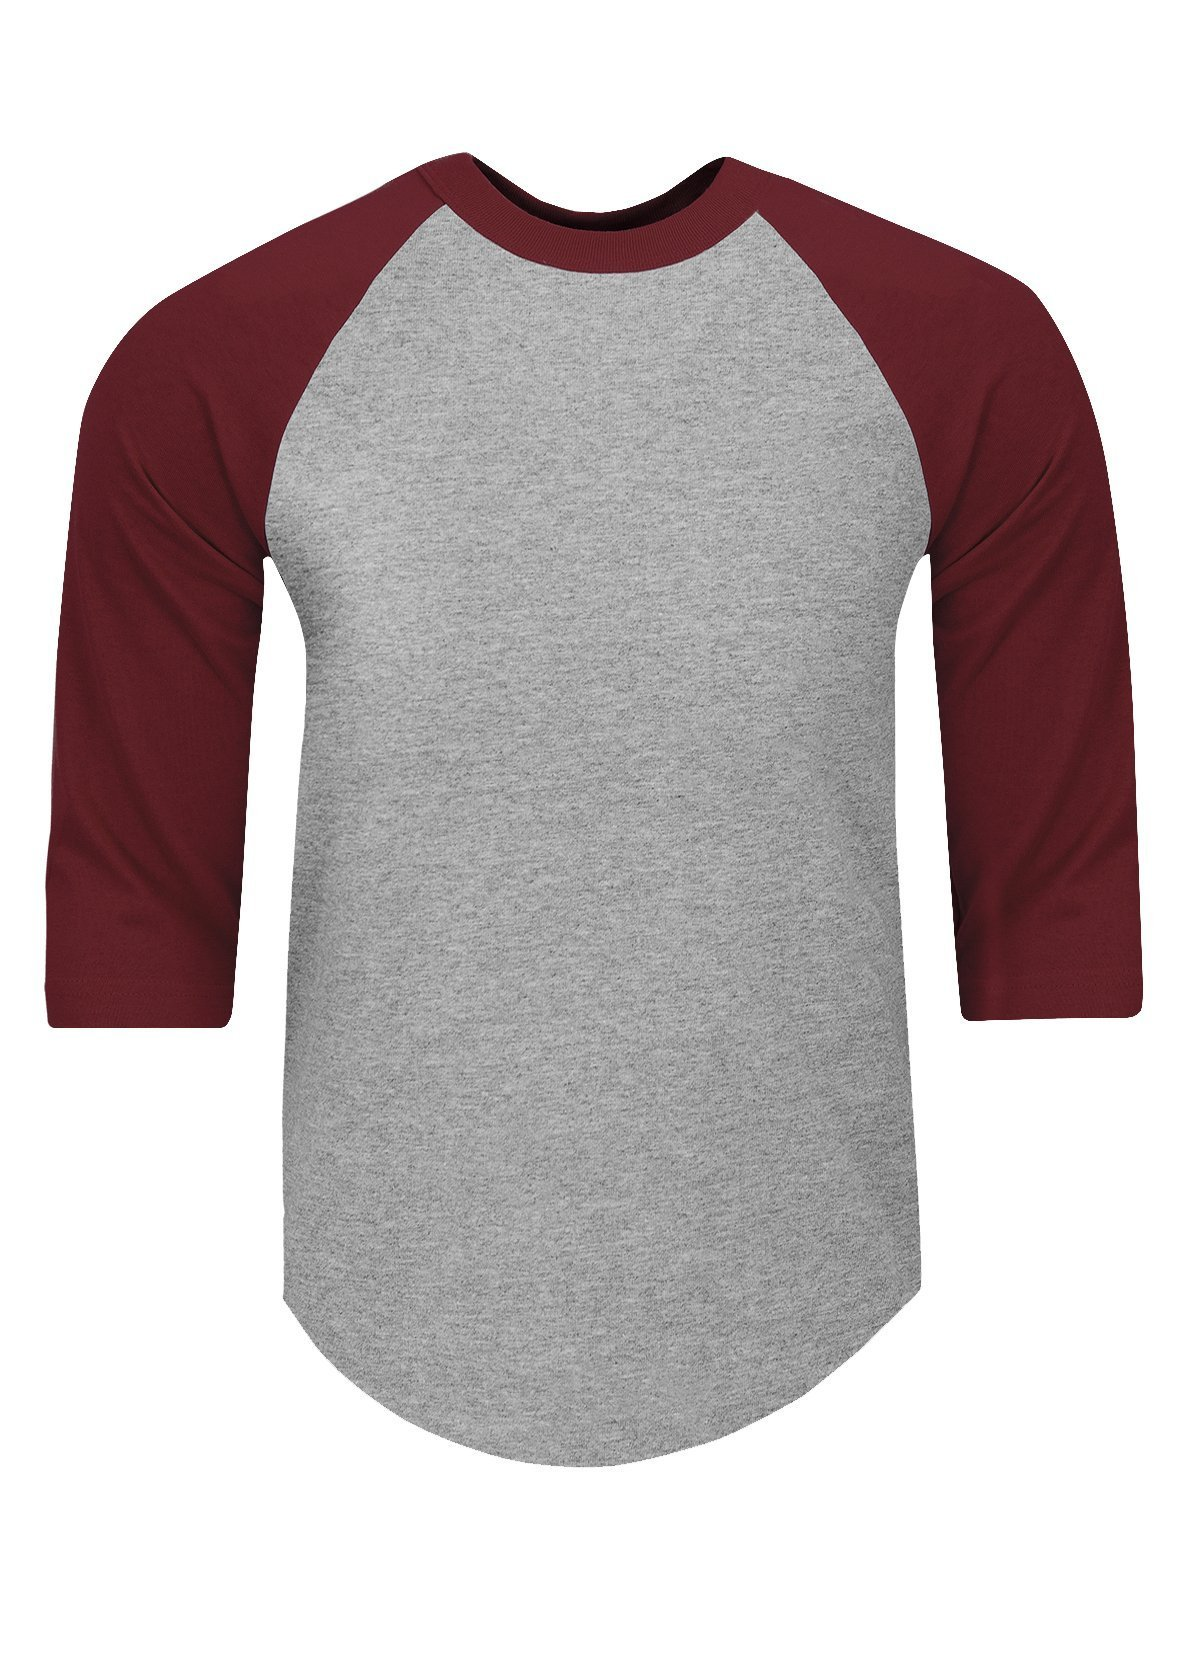 RA0525_3X Baseball T Shirts Raglan 3/4 Sleeves Tee Cotton Jersey S-5XL H.Grey/Burgundy 3X